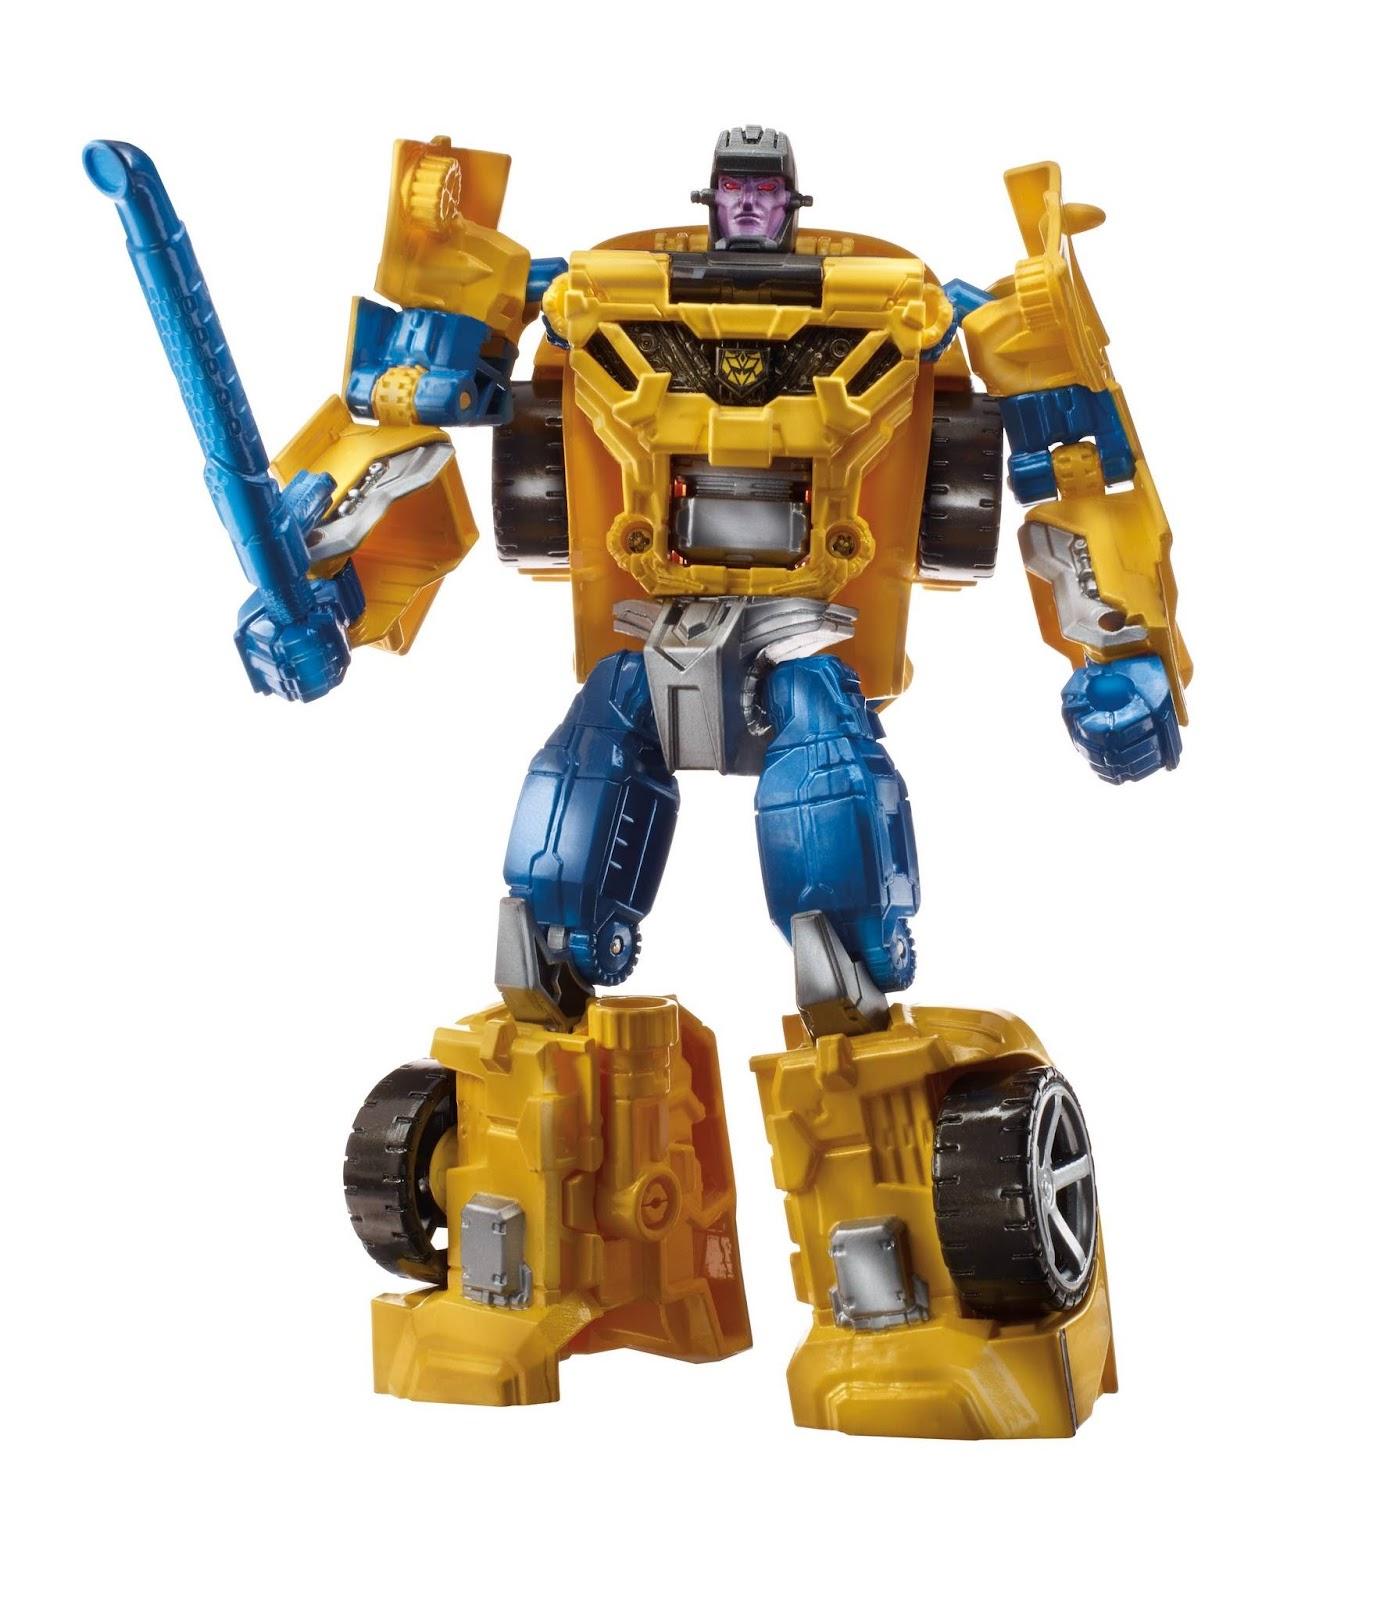 Transformers News: Transformers Combiner Wars Generation 2